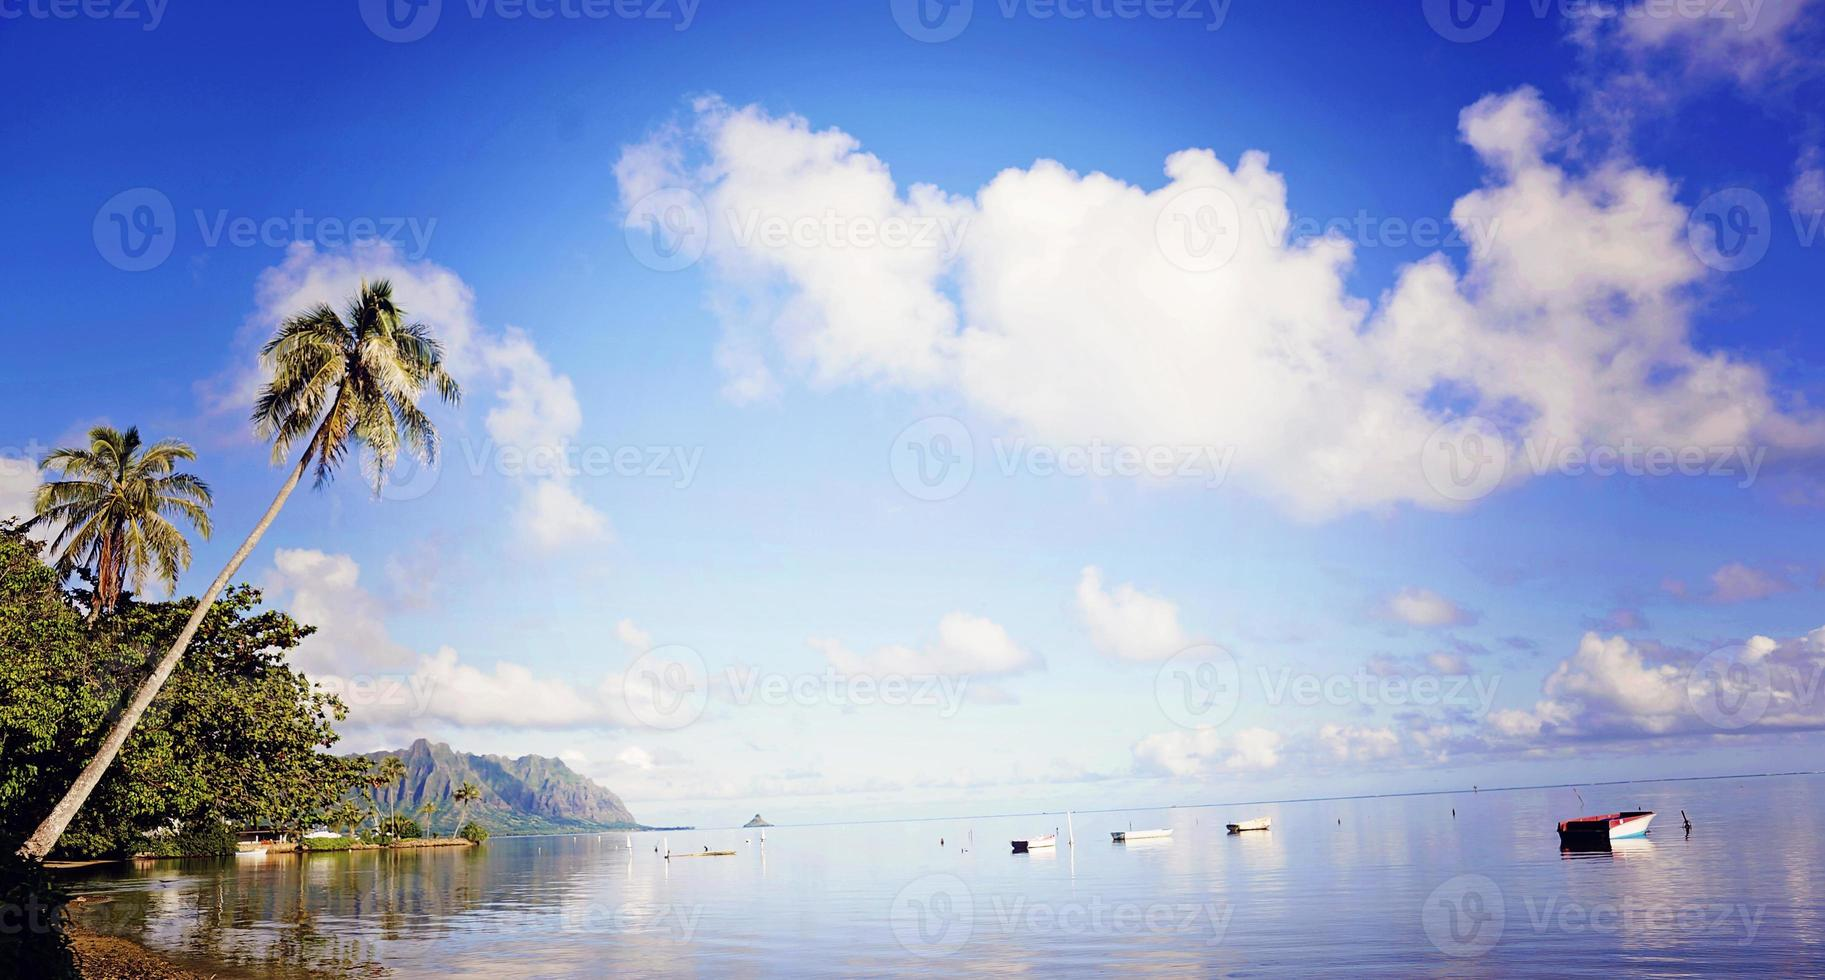 Palm Trees and Row Boats photo